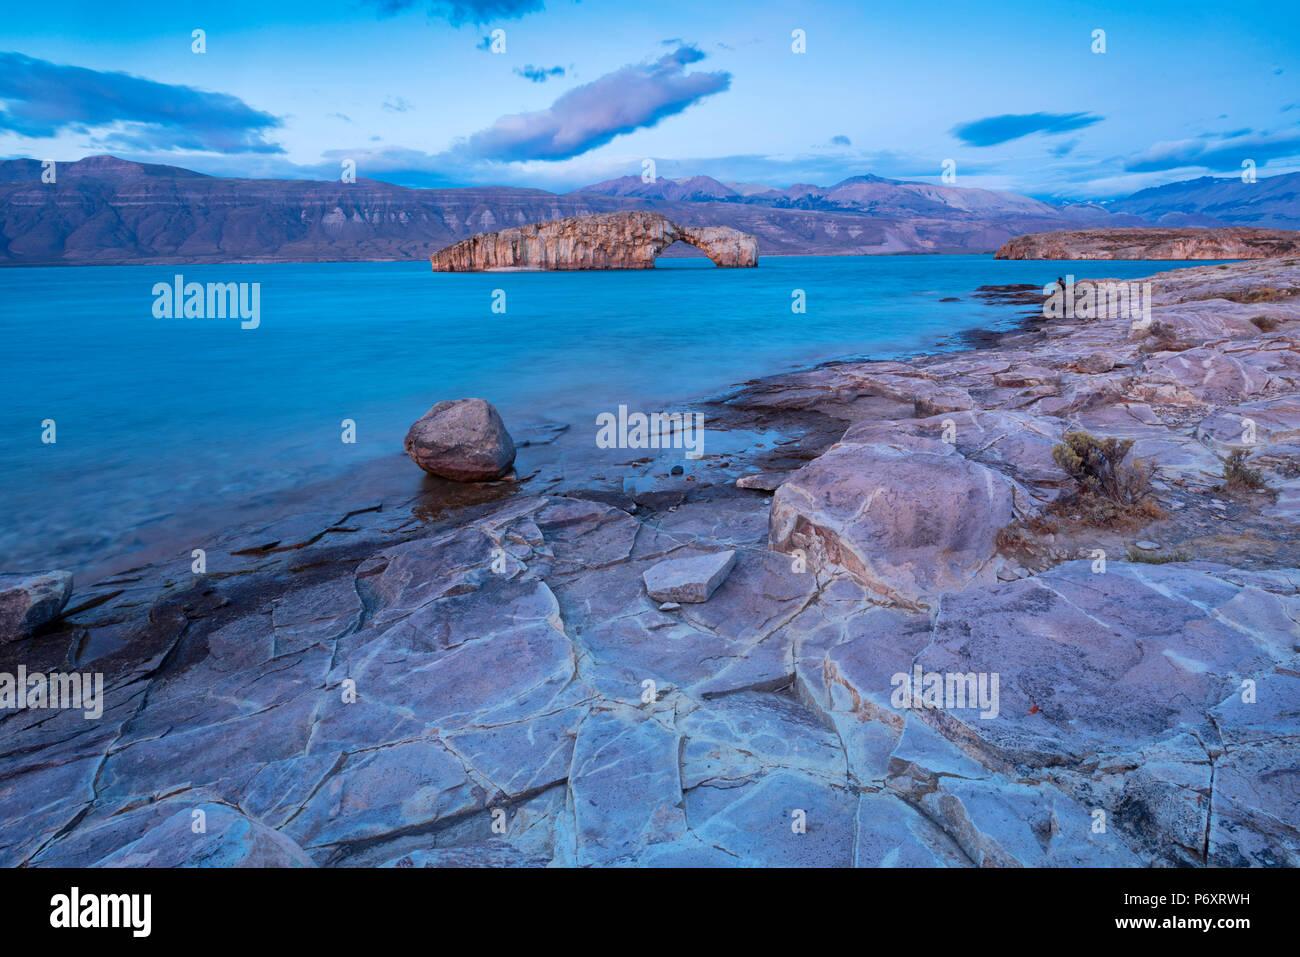 L'Amérique du Sud, Argentine, Patagonie, Santa Cruz, Lago Posadas Photo Stock